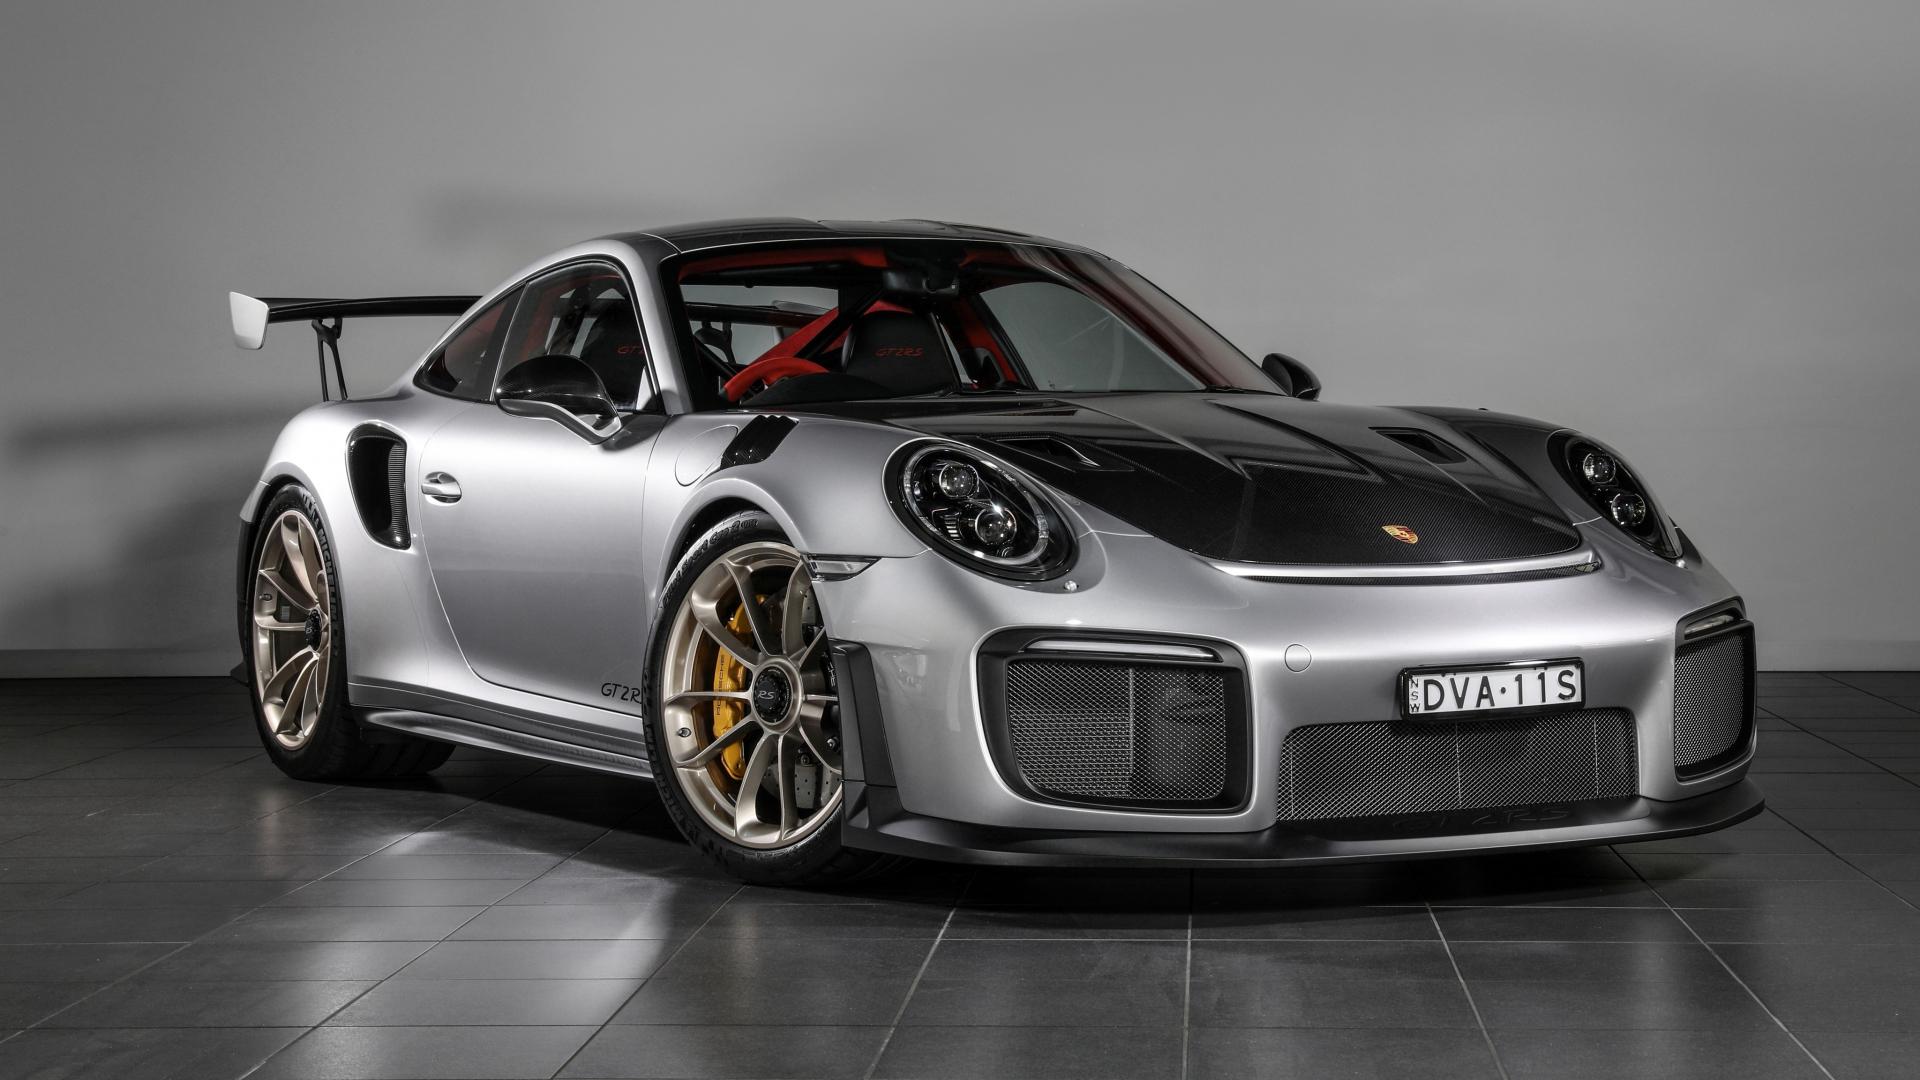 Download 1920x1080 Wallpaper 2018 Porsche 911 Gt3 Rs Grey Sports Car Full Hd Hdtv Fhd 1080p 1920x1080 Hd Image Background 5275